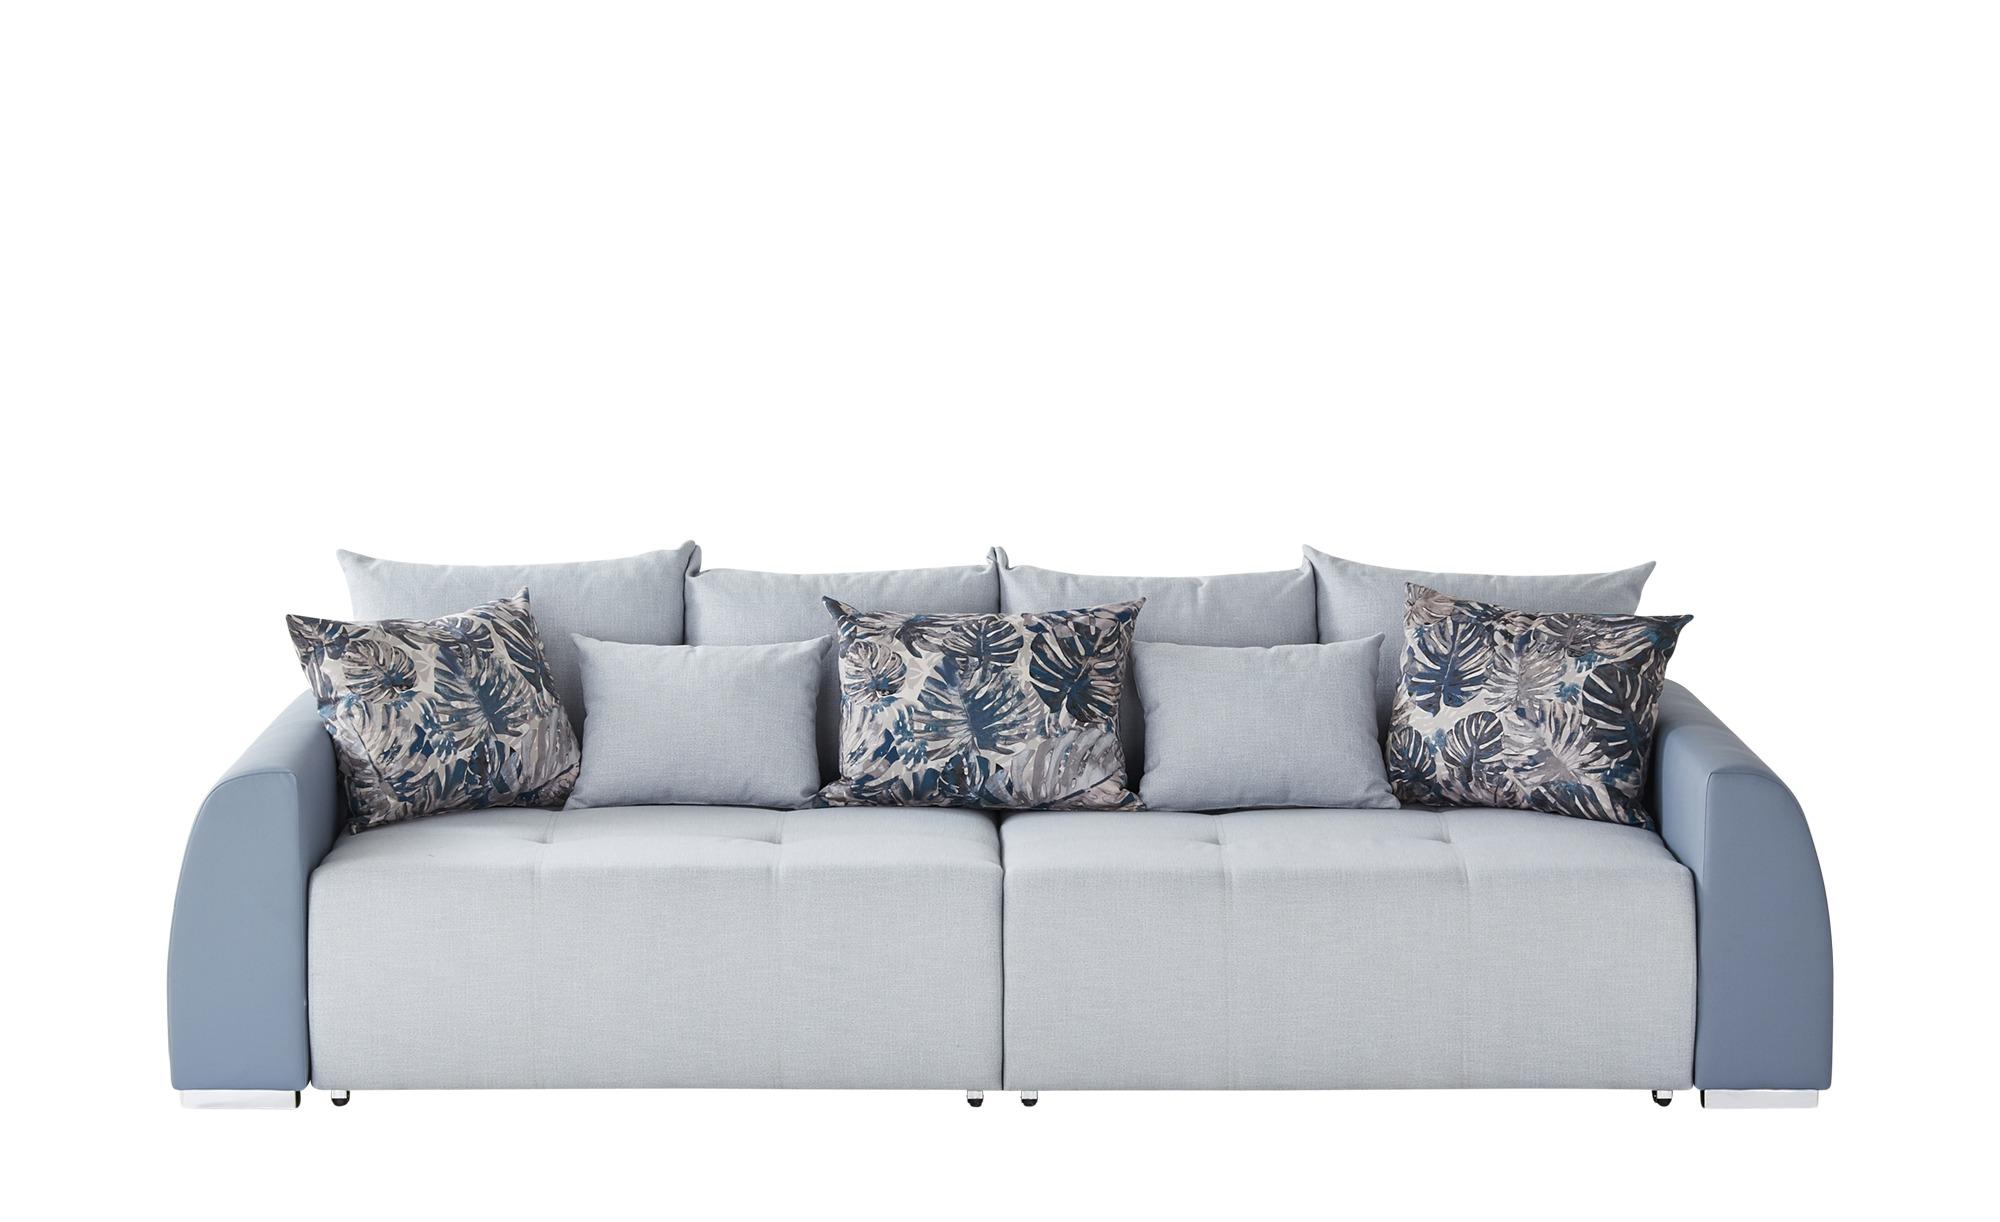 switch Big Sofa  Ego ¦ blau ¦ Maße (cm): B: 290 H: 81 T: 140 Polstermöbel > Sofas > Big-Sofas - Höffner